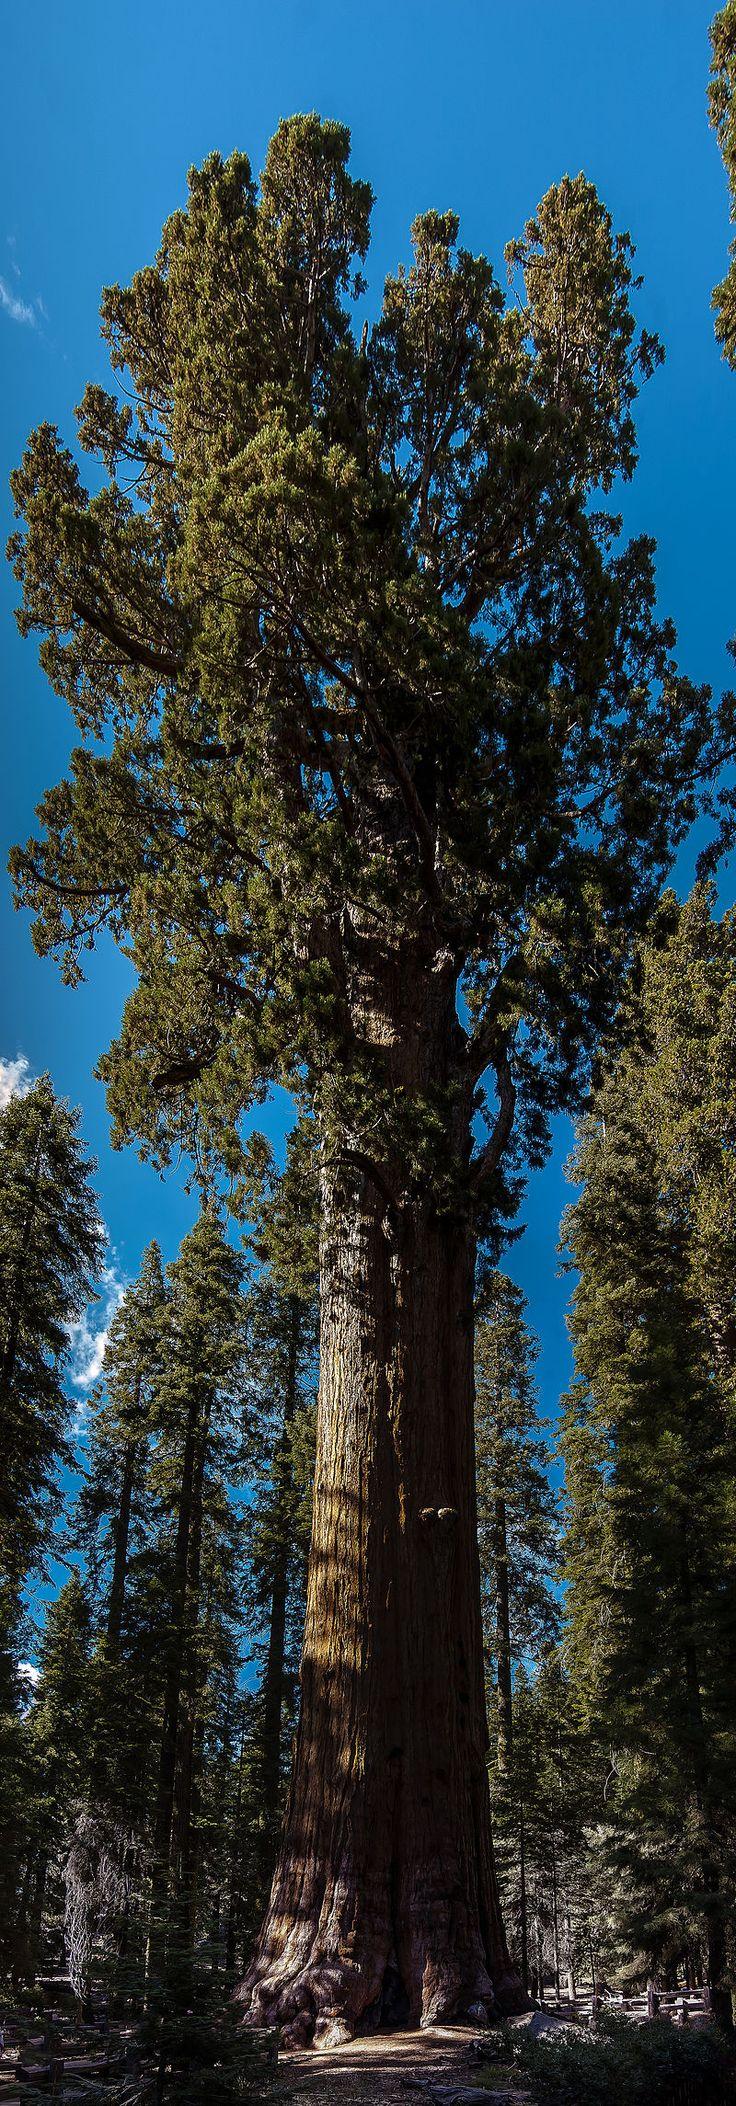 United States - California - Sequoia National Park - General Sherman Tree - Panorama - General Sherman (tree) - Wikipedia